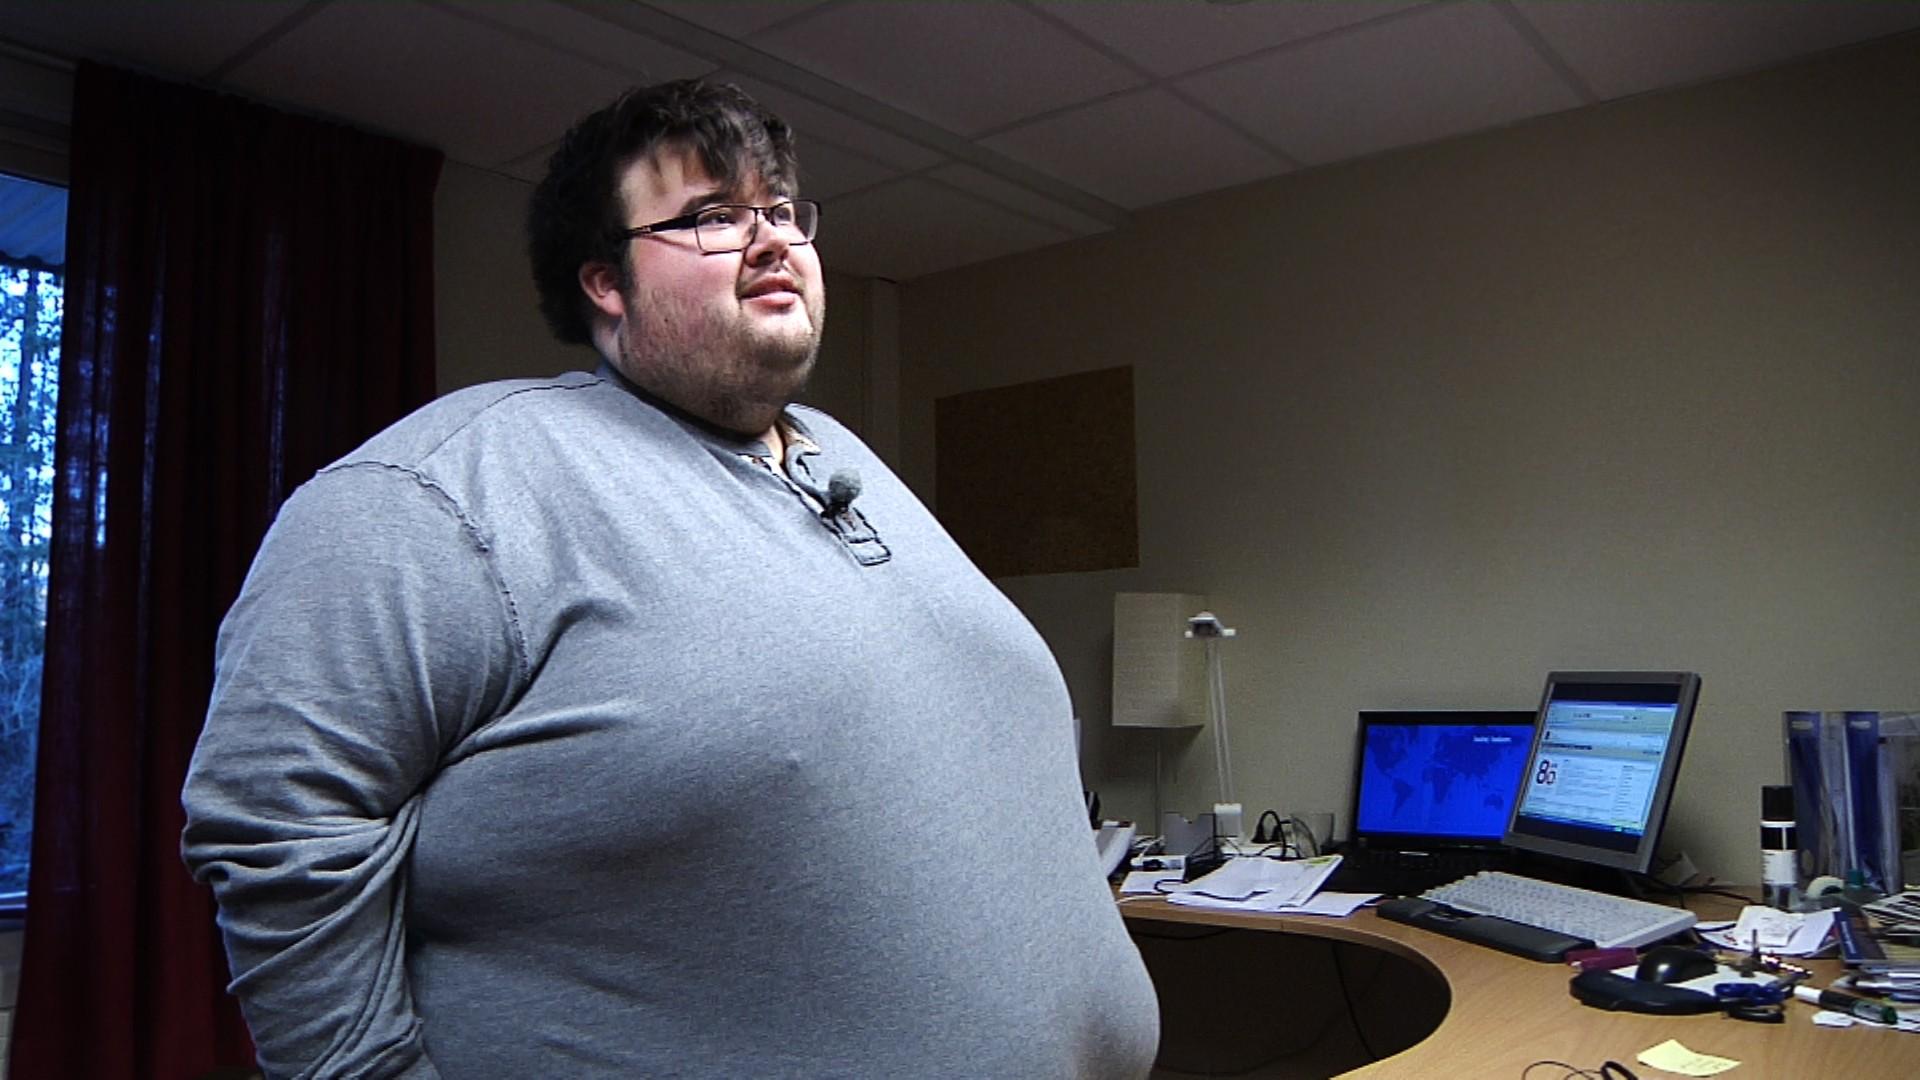 ekstrem overvekt